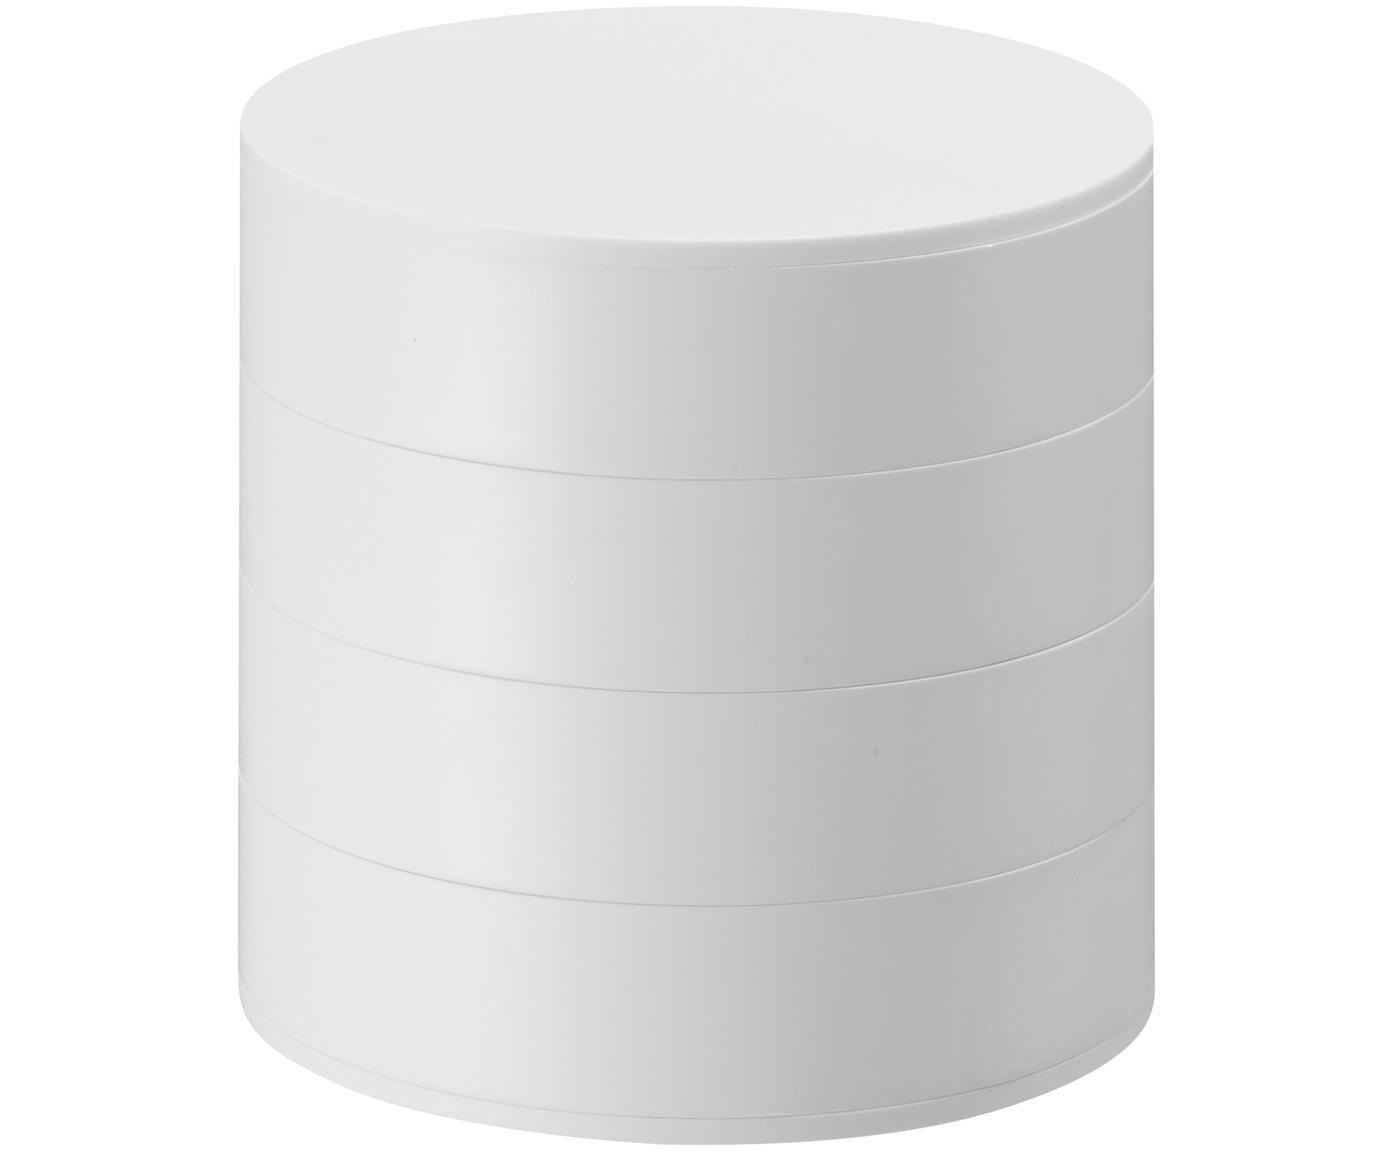 Sieradendoos Tower, Wit, Ø 10 x H 10 cm